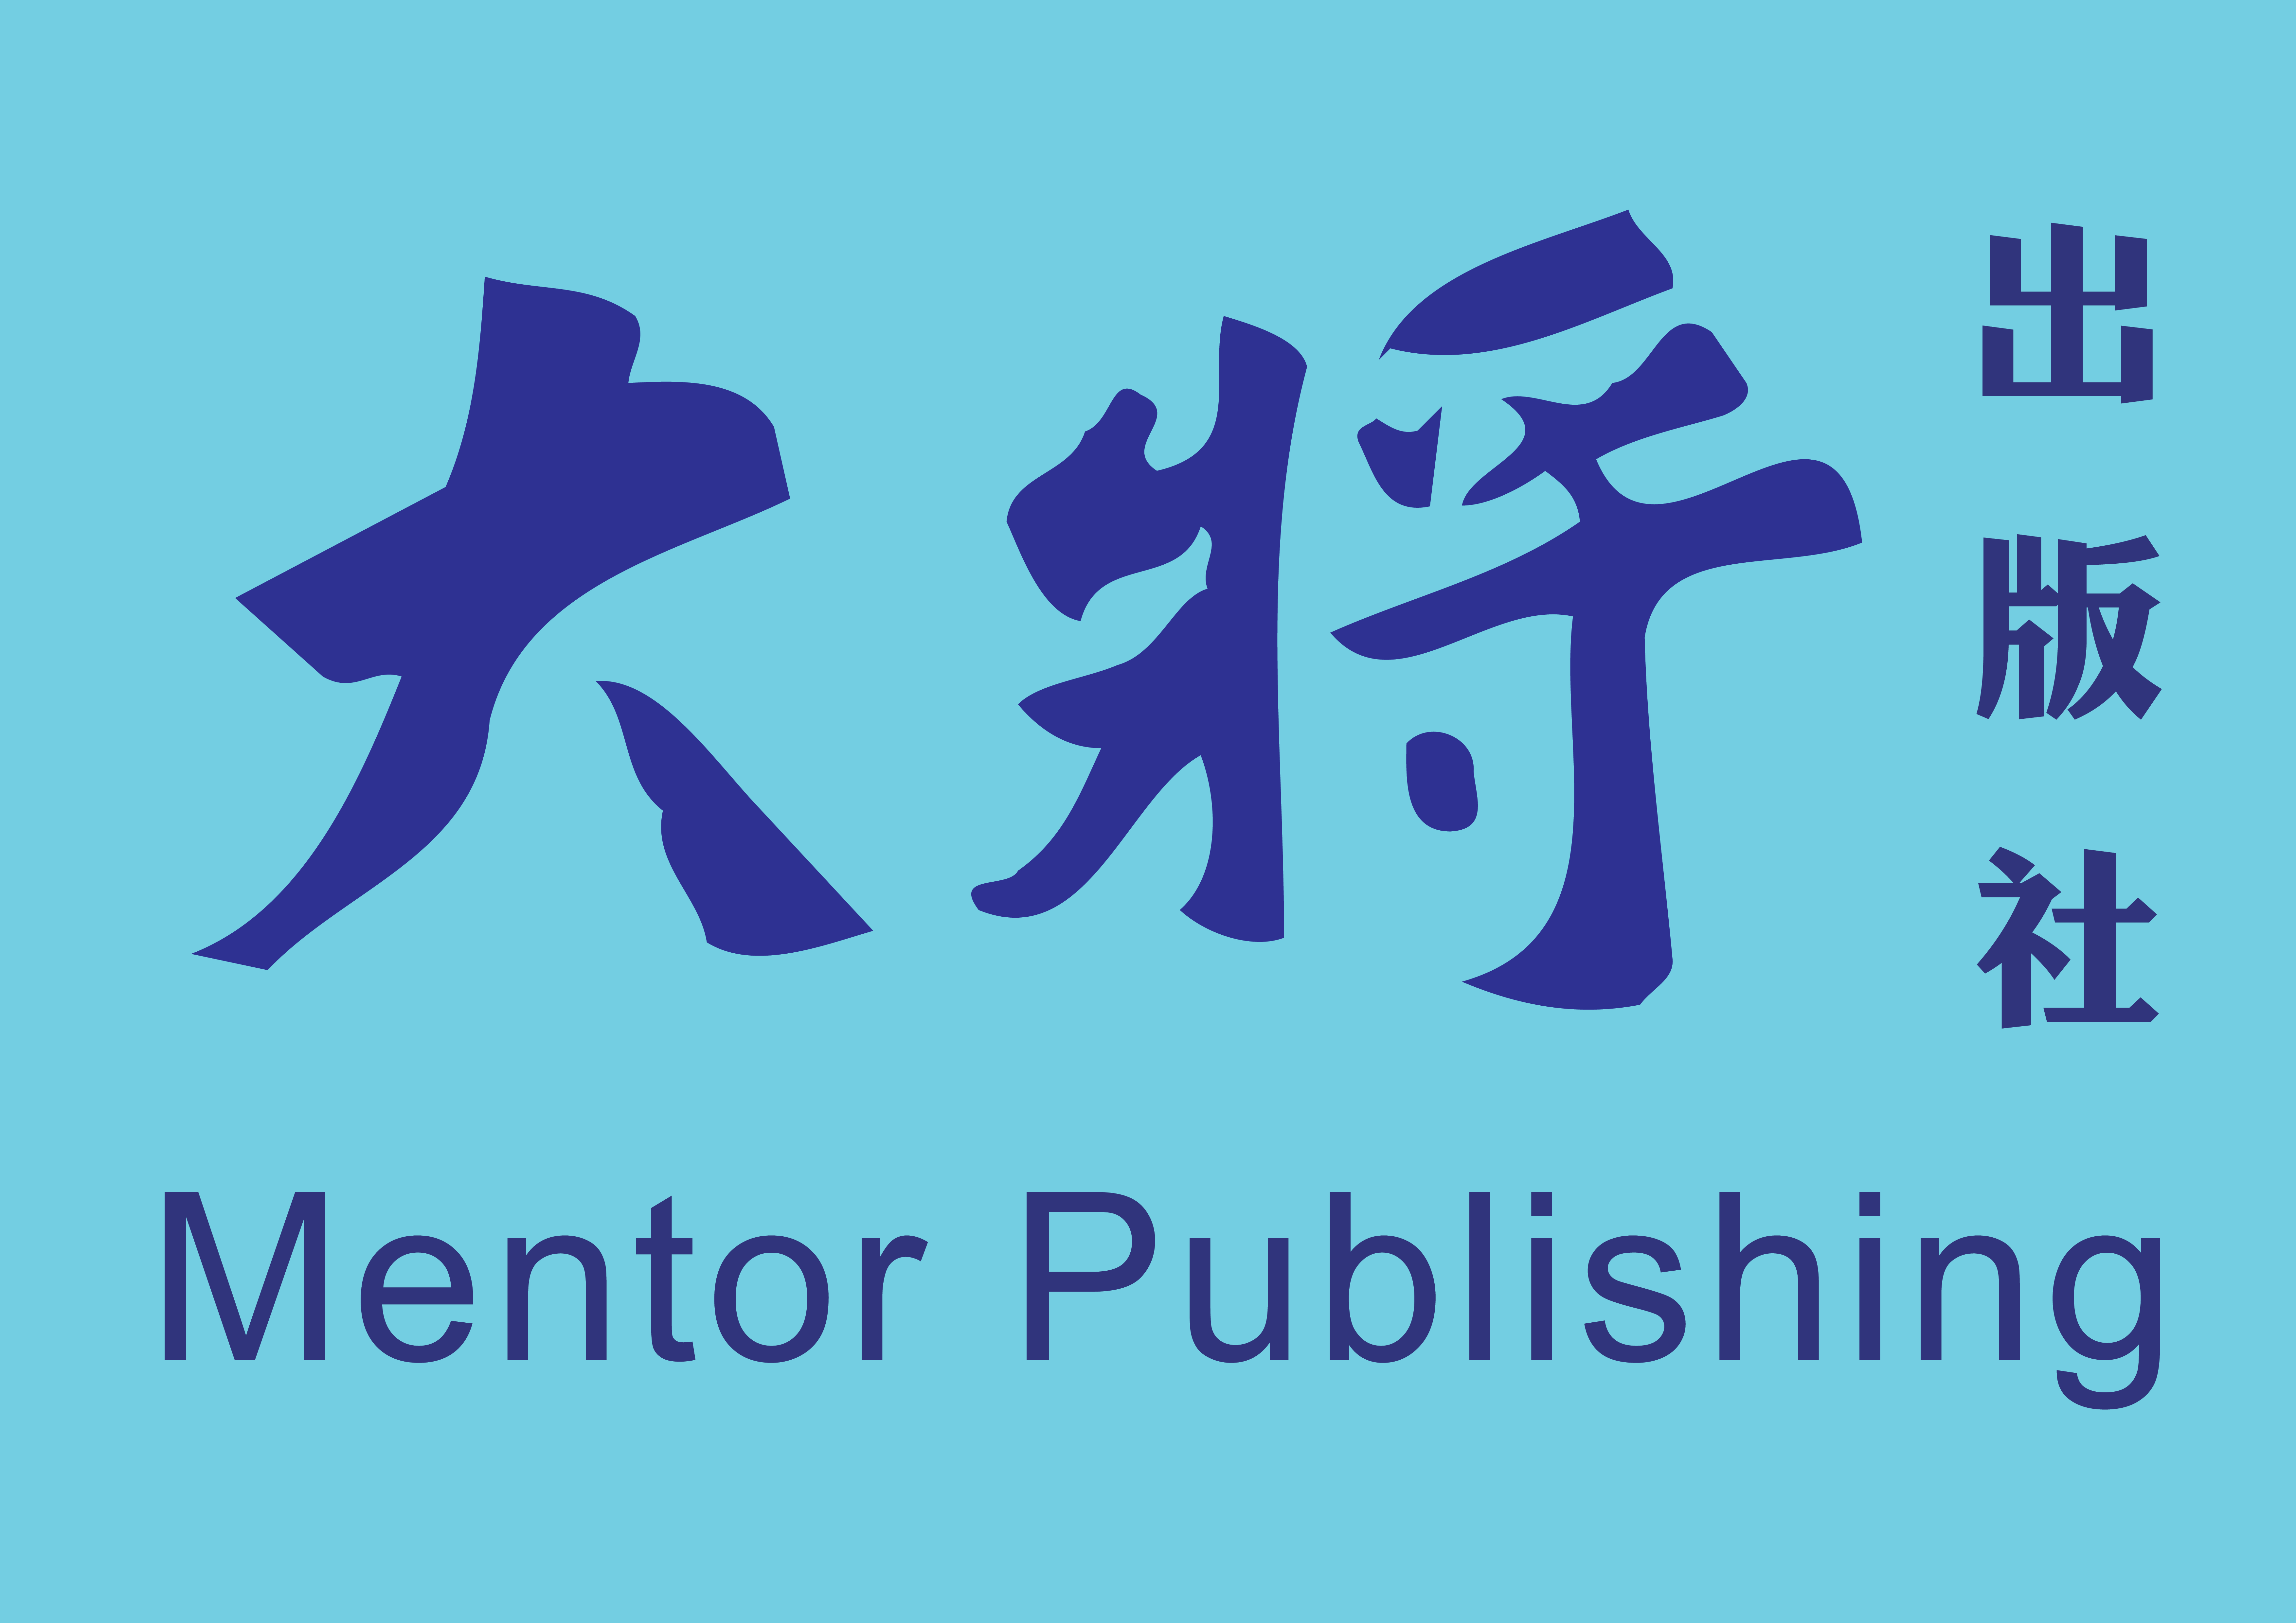 MentorPublishing